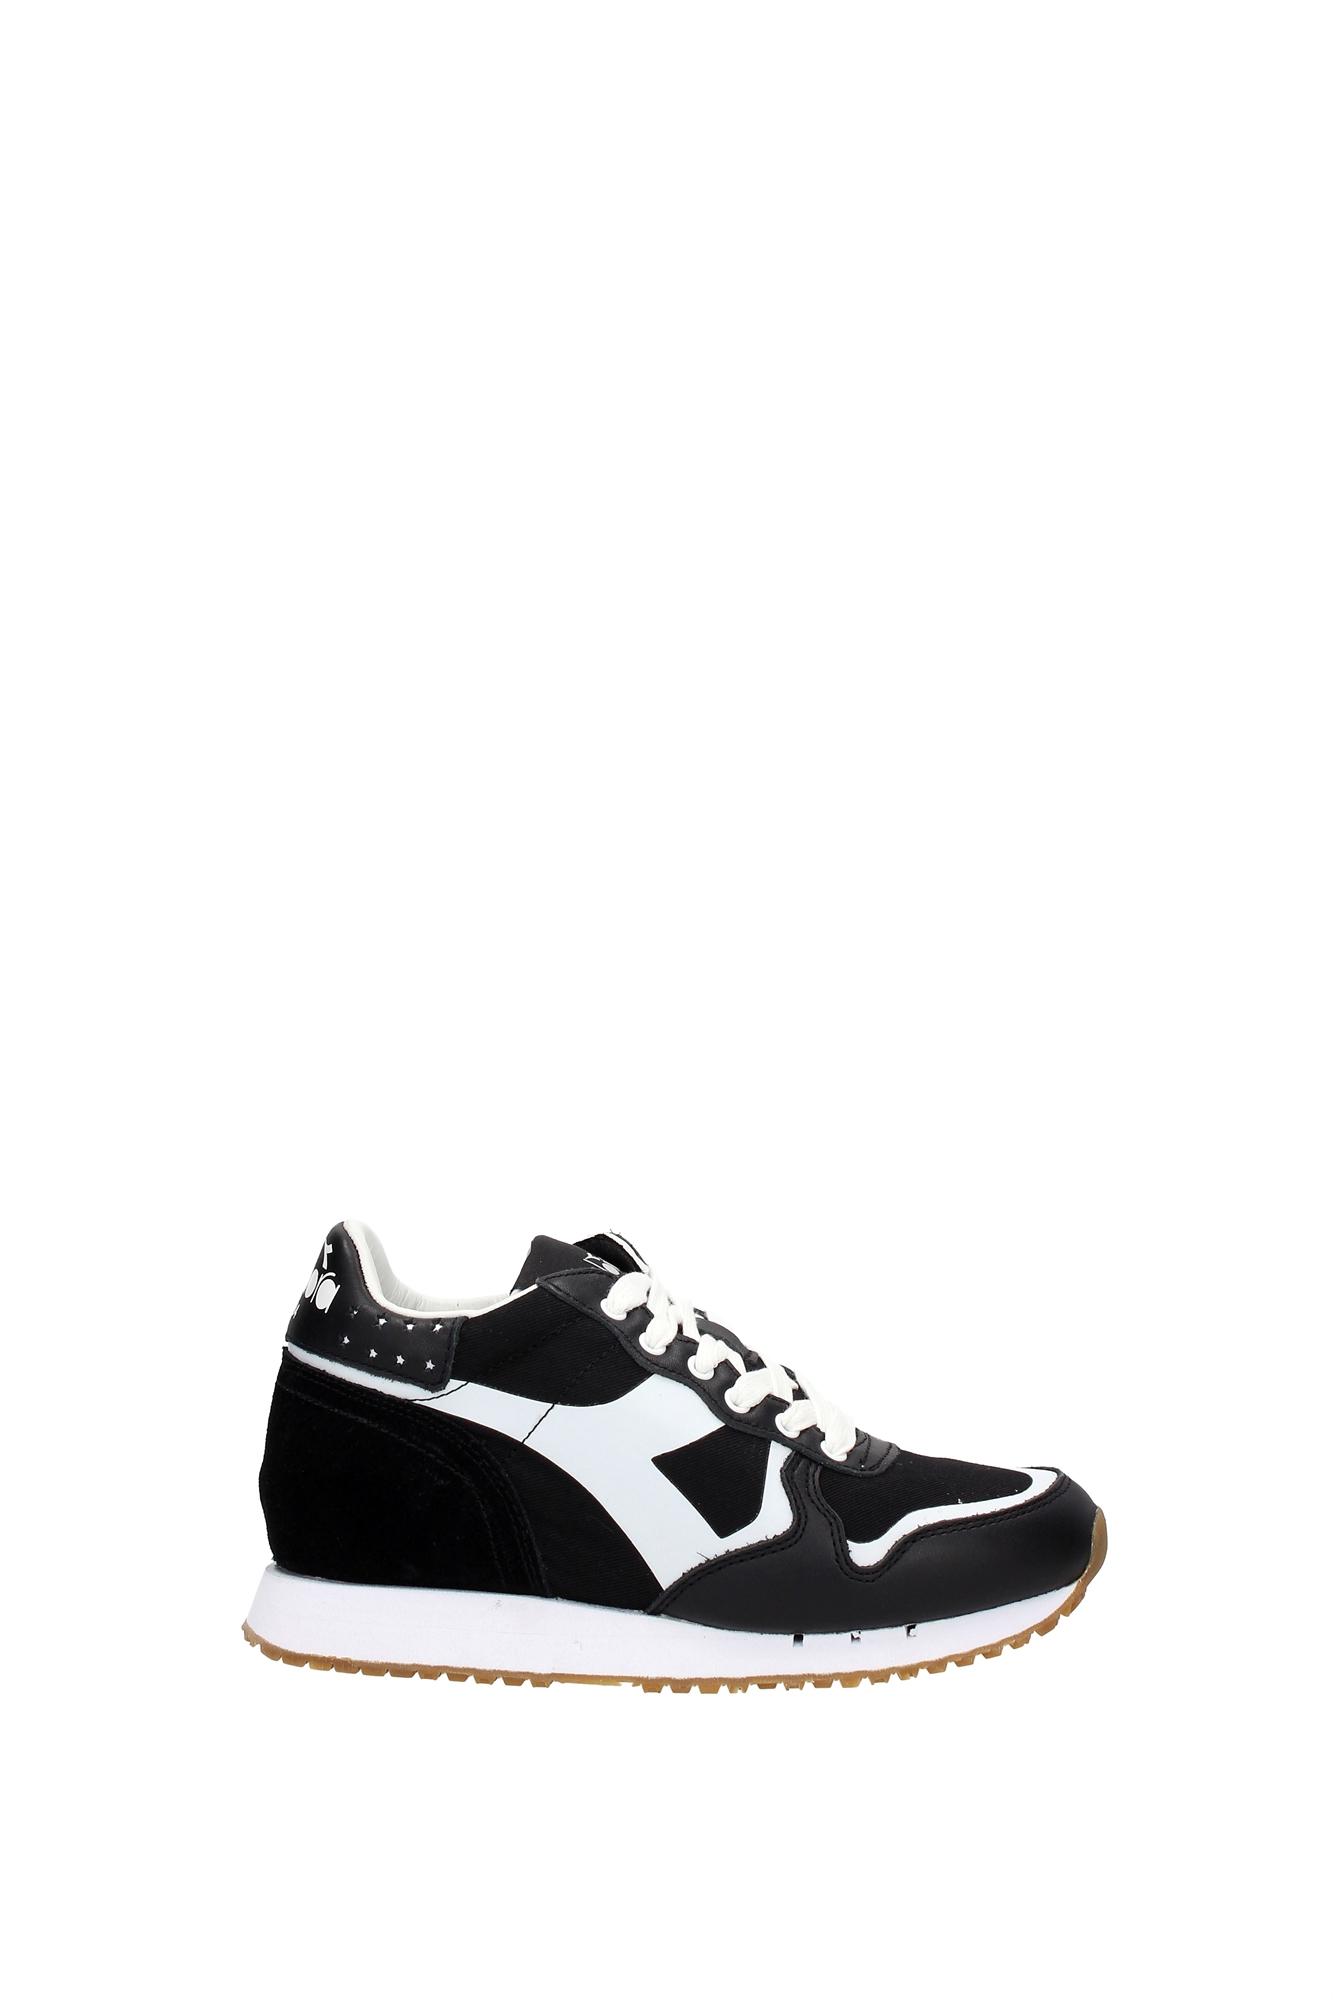 Sneakers Diadora Heritage - Damenschuhe - Heritage Camoscio (20117058701C0641) d2ebc8